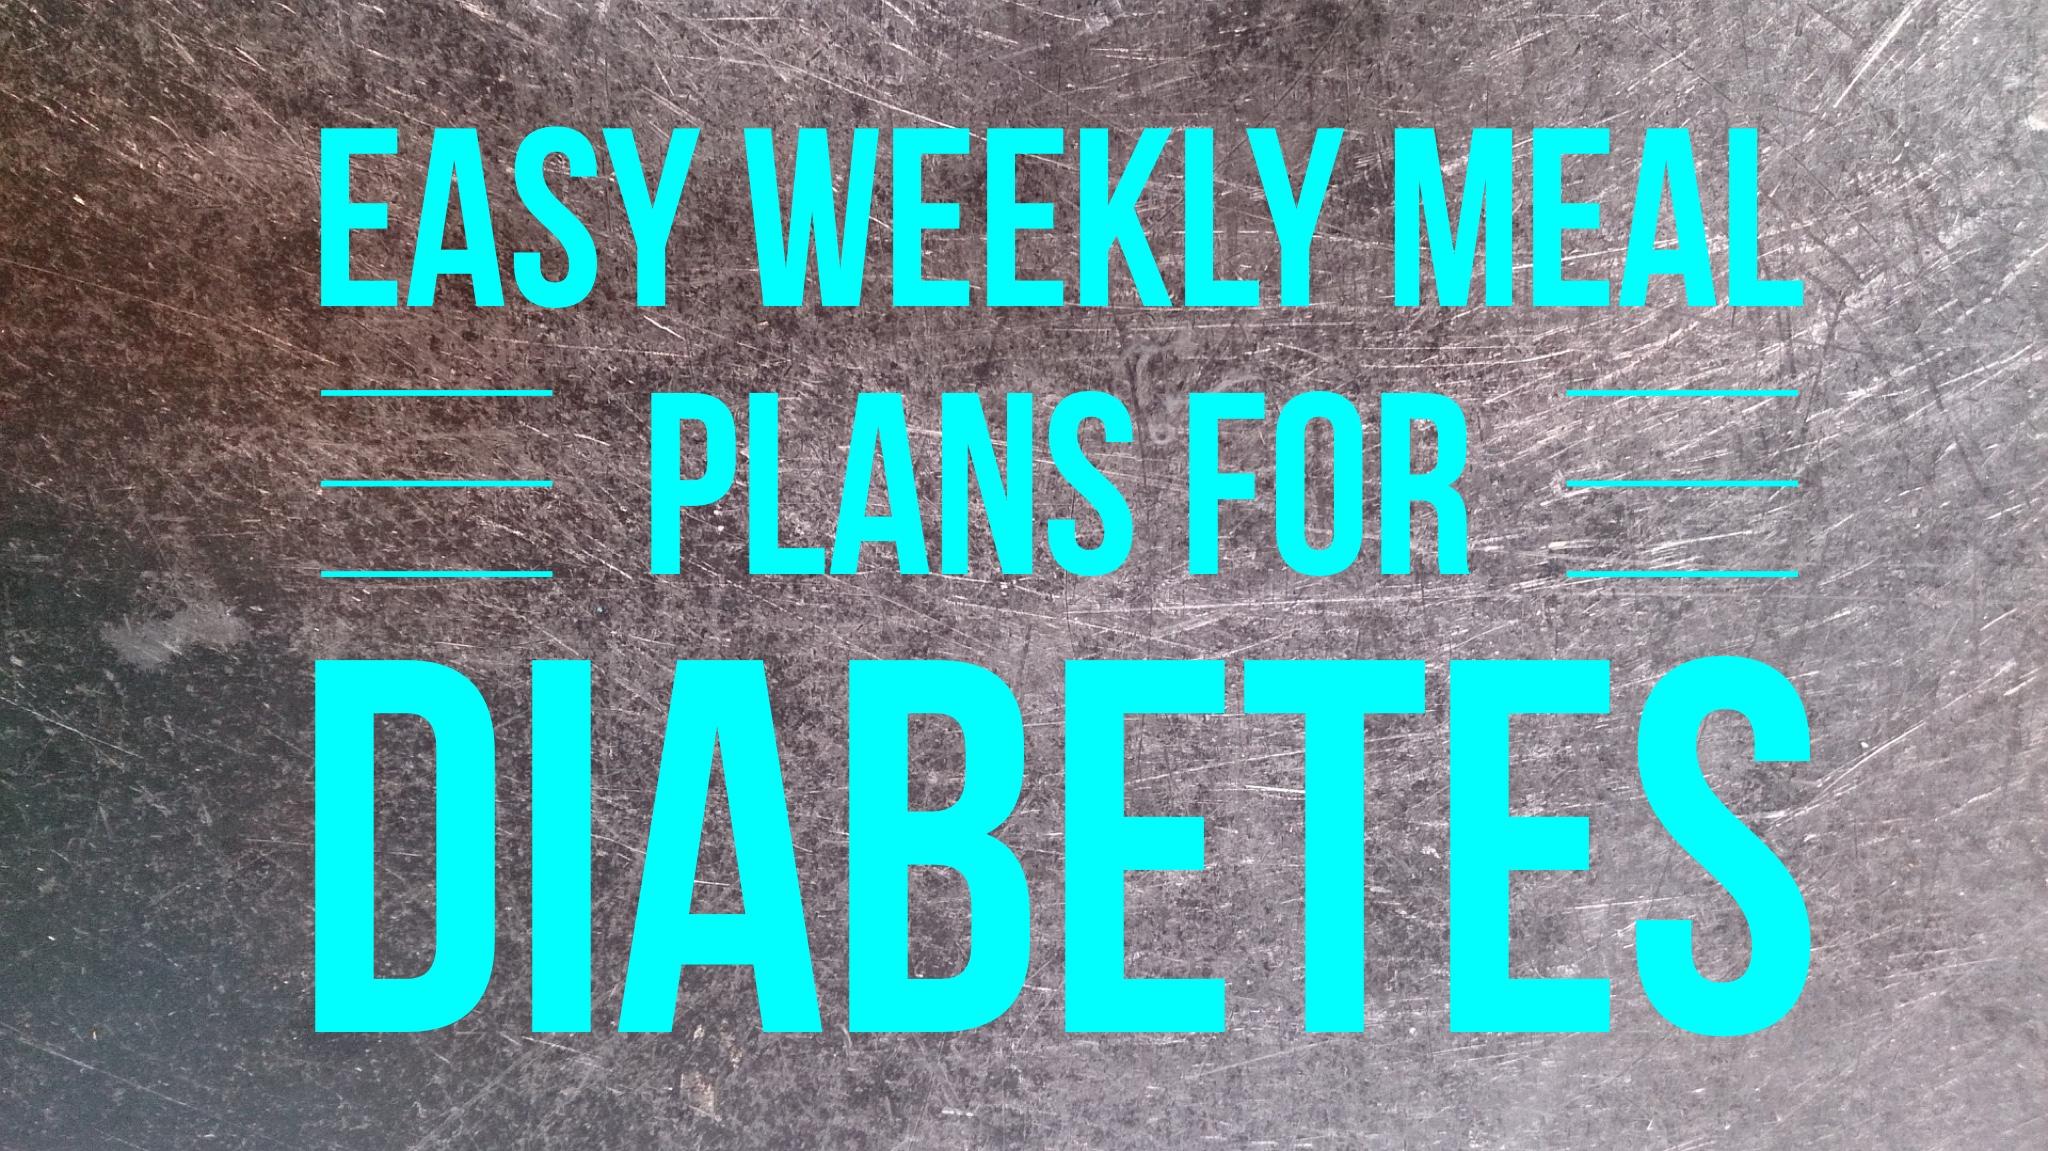 Easy Weekly Meal Plan For Diabetes